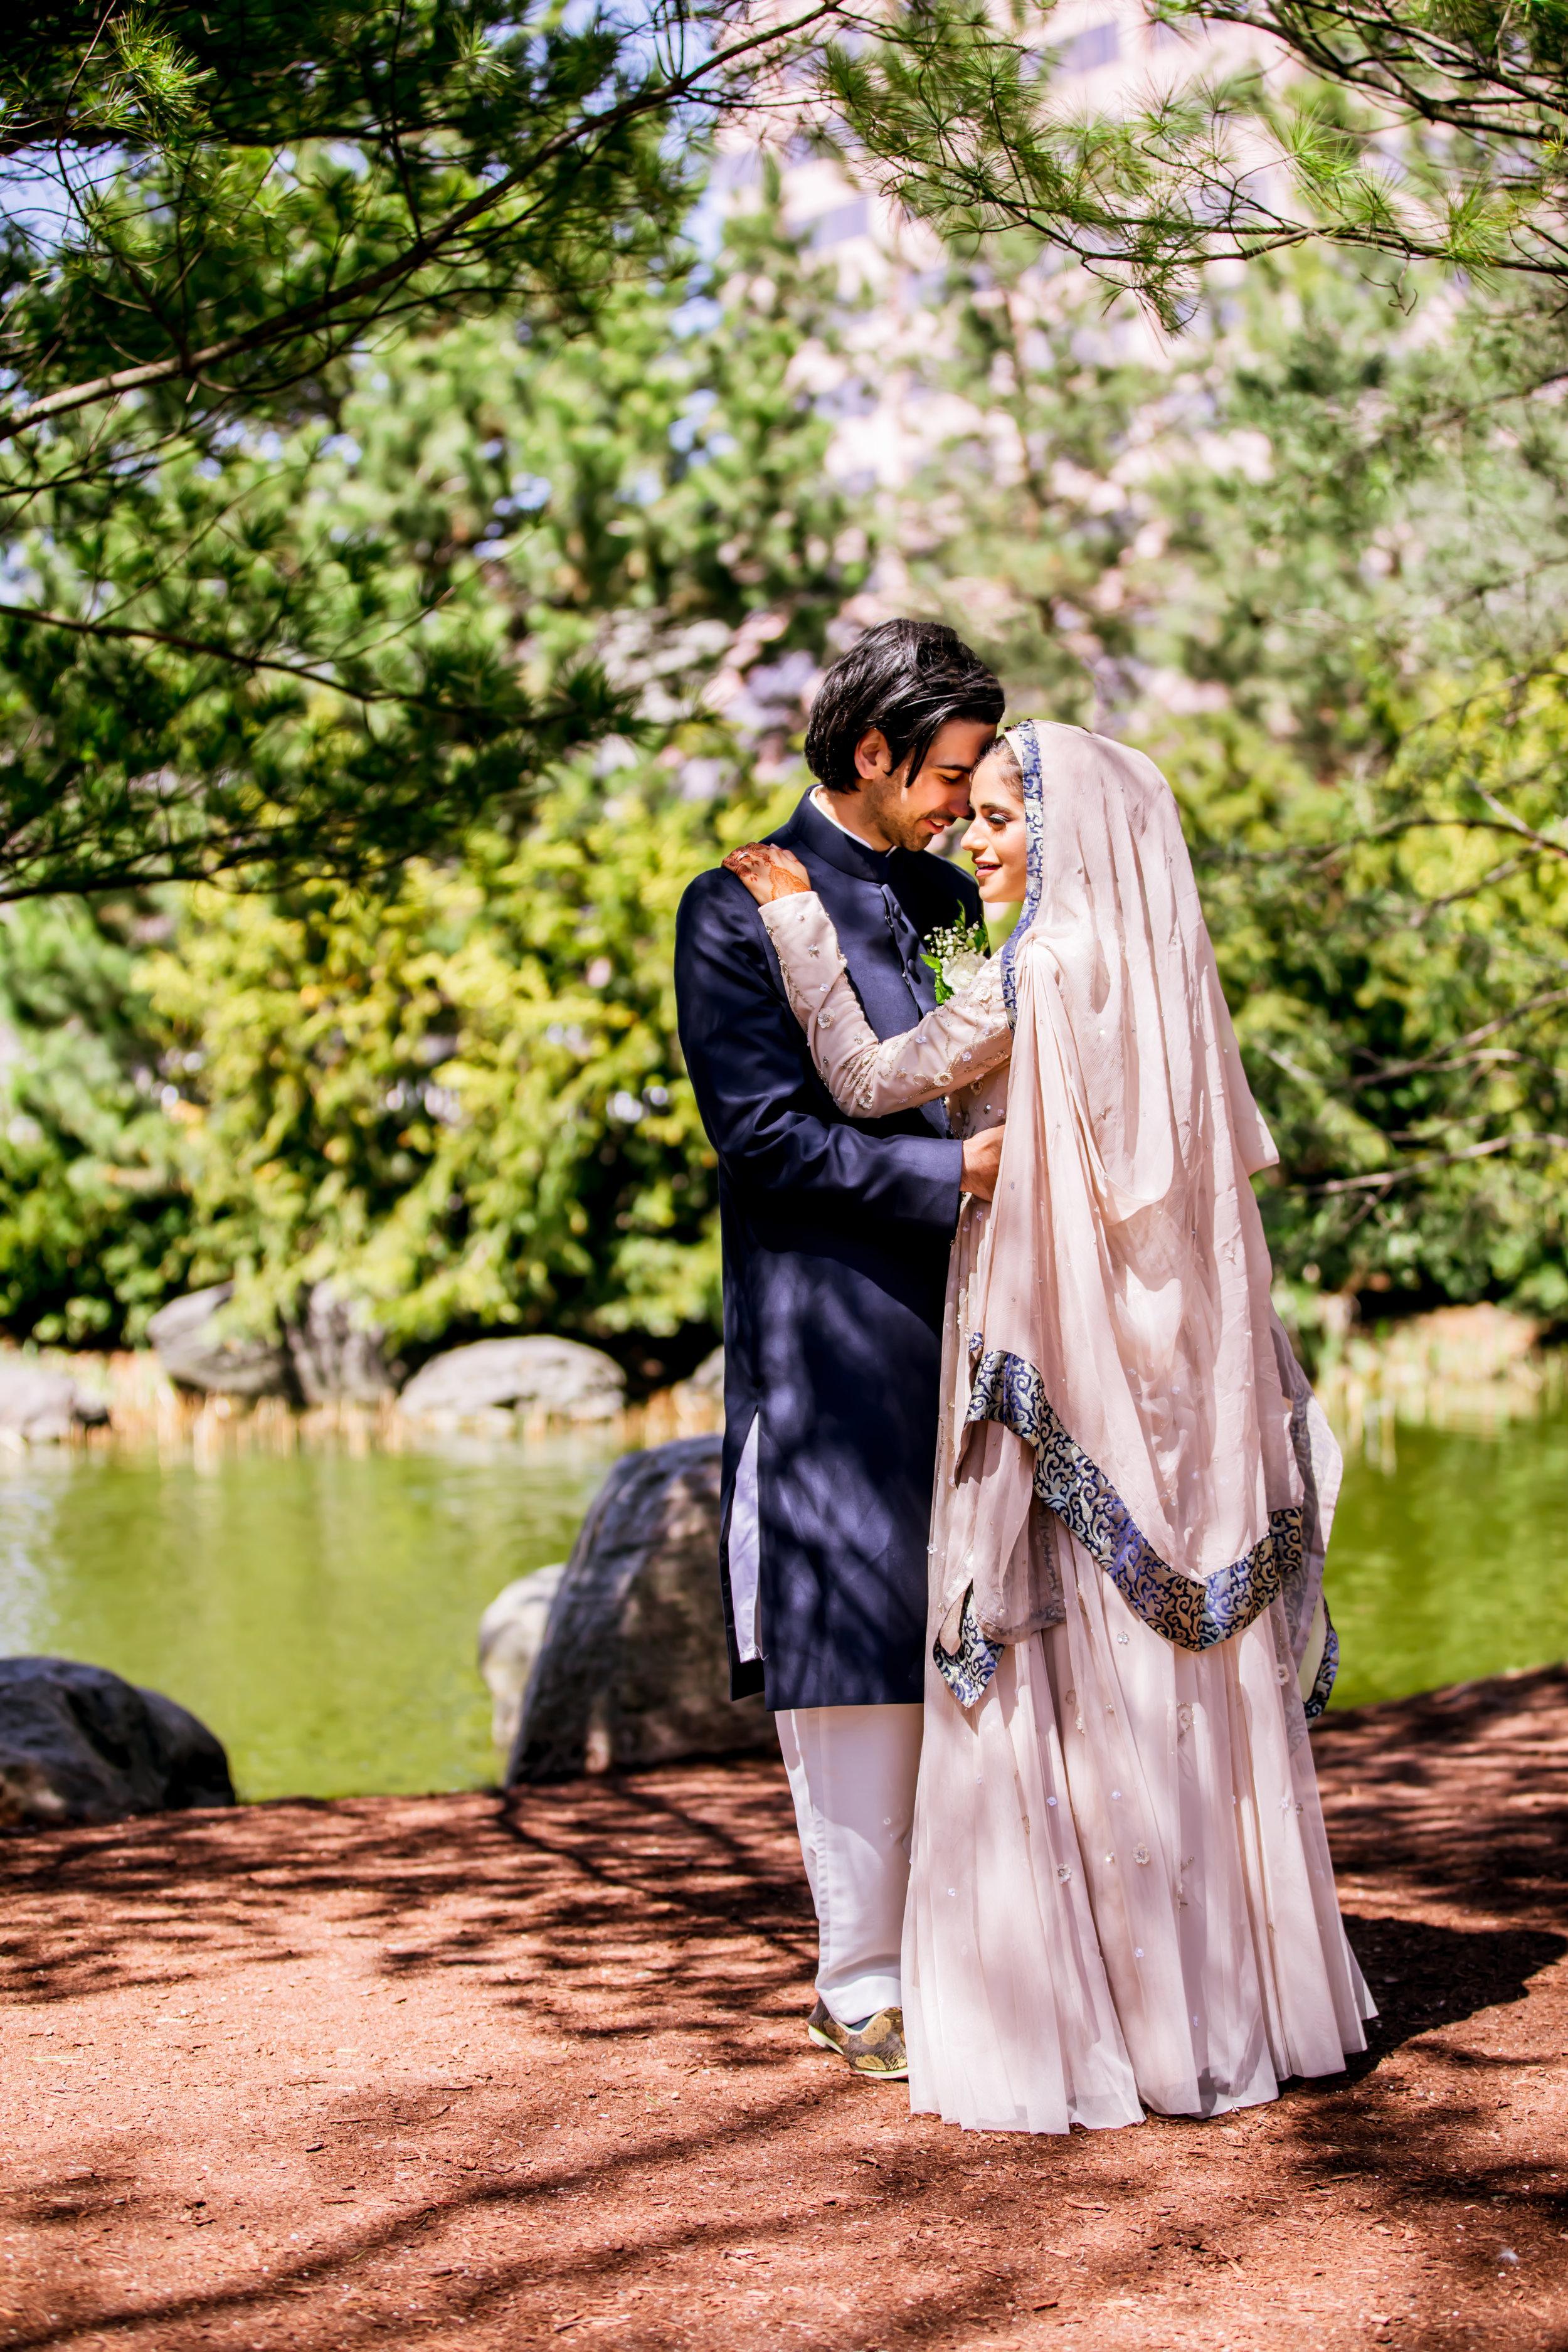 Karimah_Gheddai_Muslim_Sayeda_Khadija_Centre_Kariya_Park_GTA-Pakistani-Indian-Wedding-Engagement-Photographer-Photography_0002